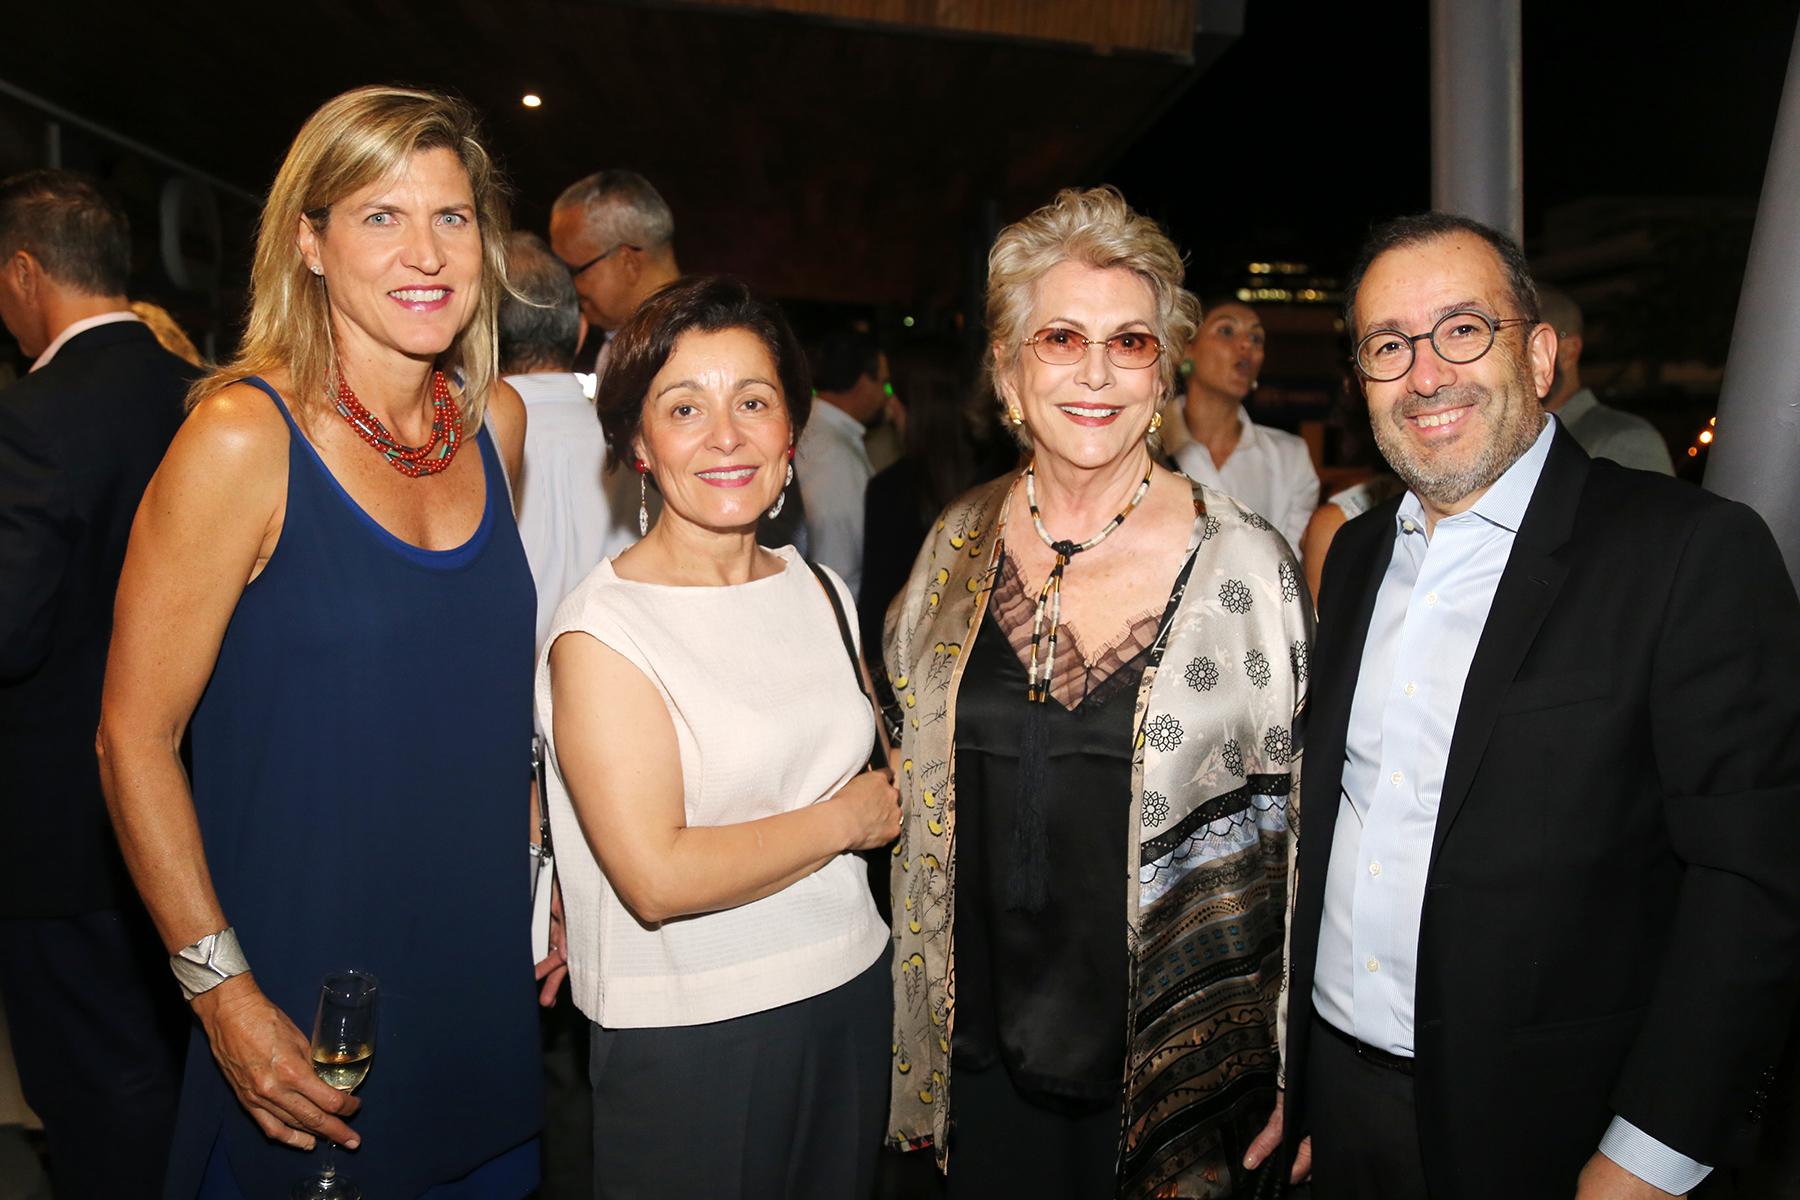 Kiki Rivera, Margot Marchand, Luisa Rangel de Ferré y Jorge Cabezas. (Foto: Nichole Saldarriaga)